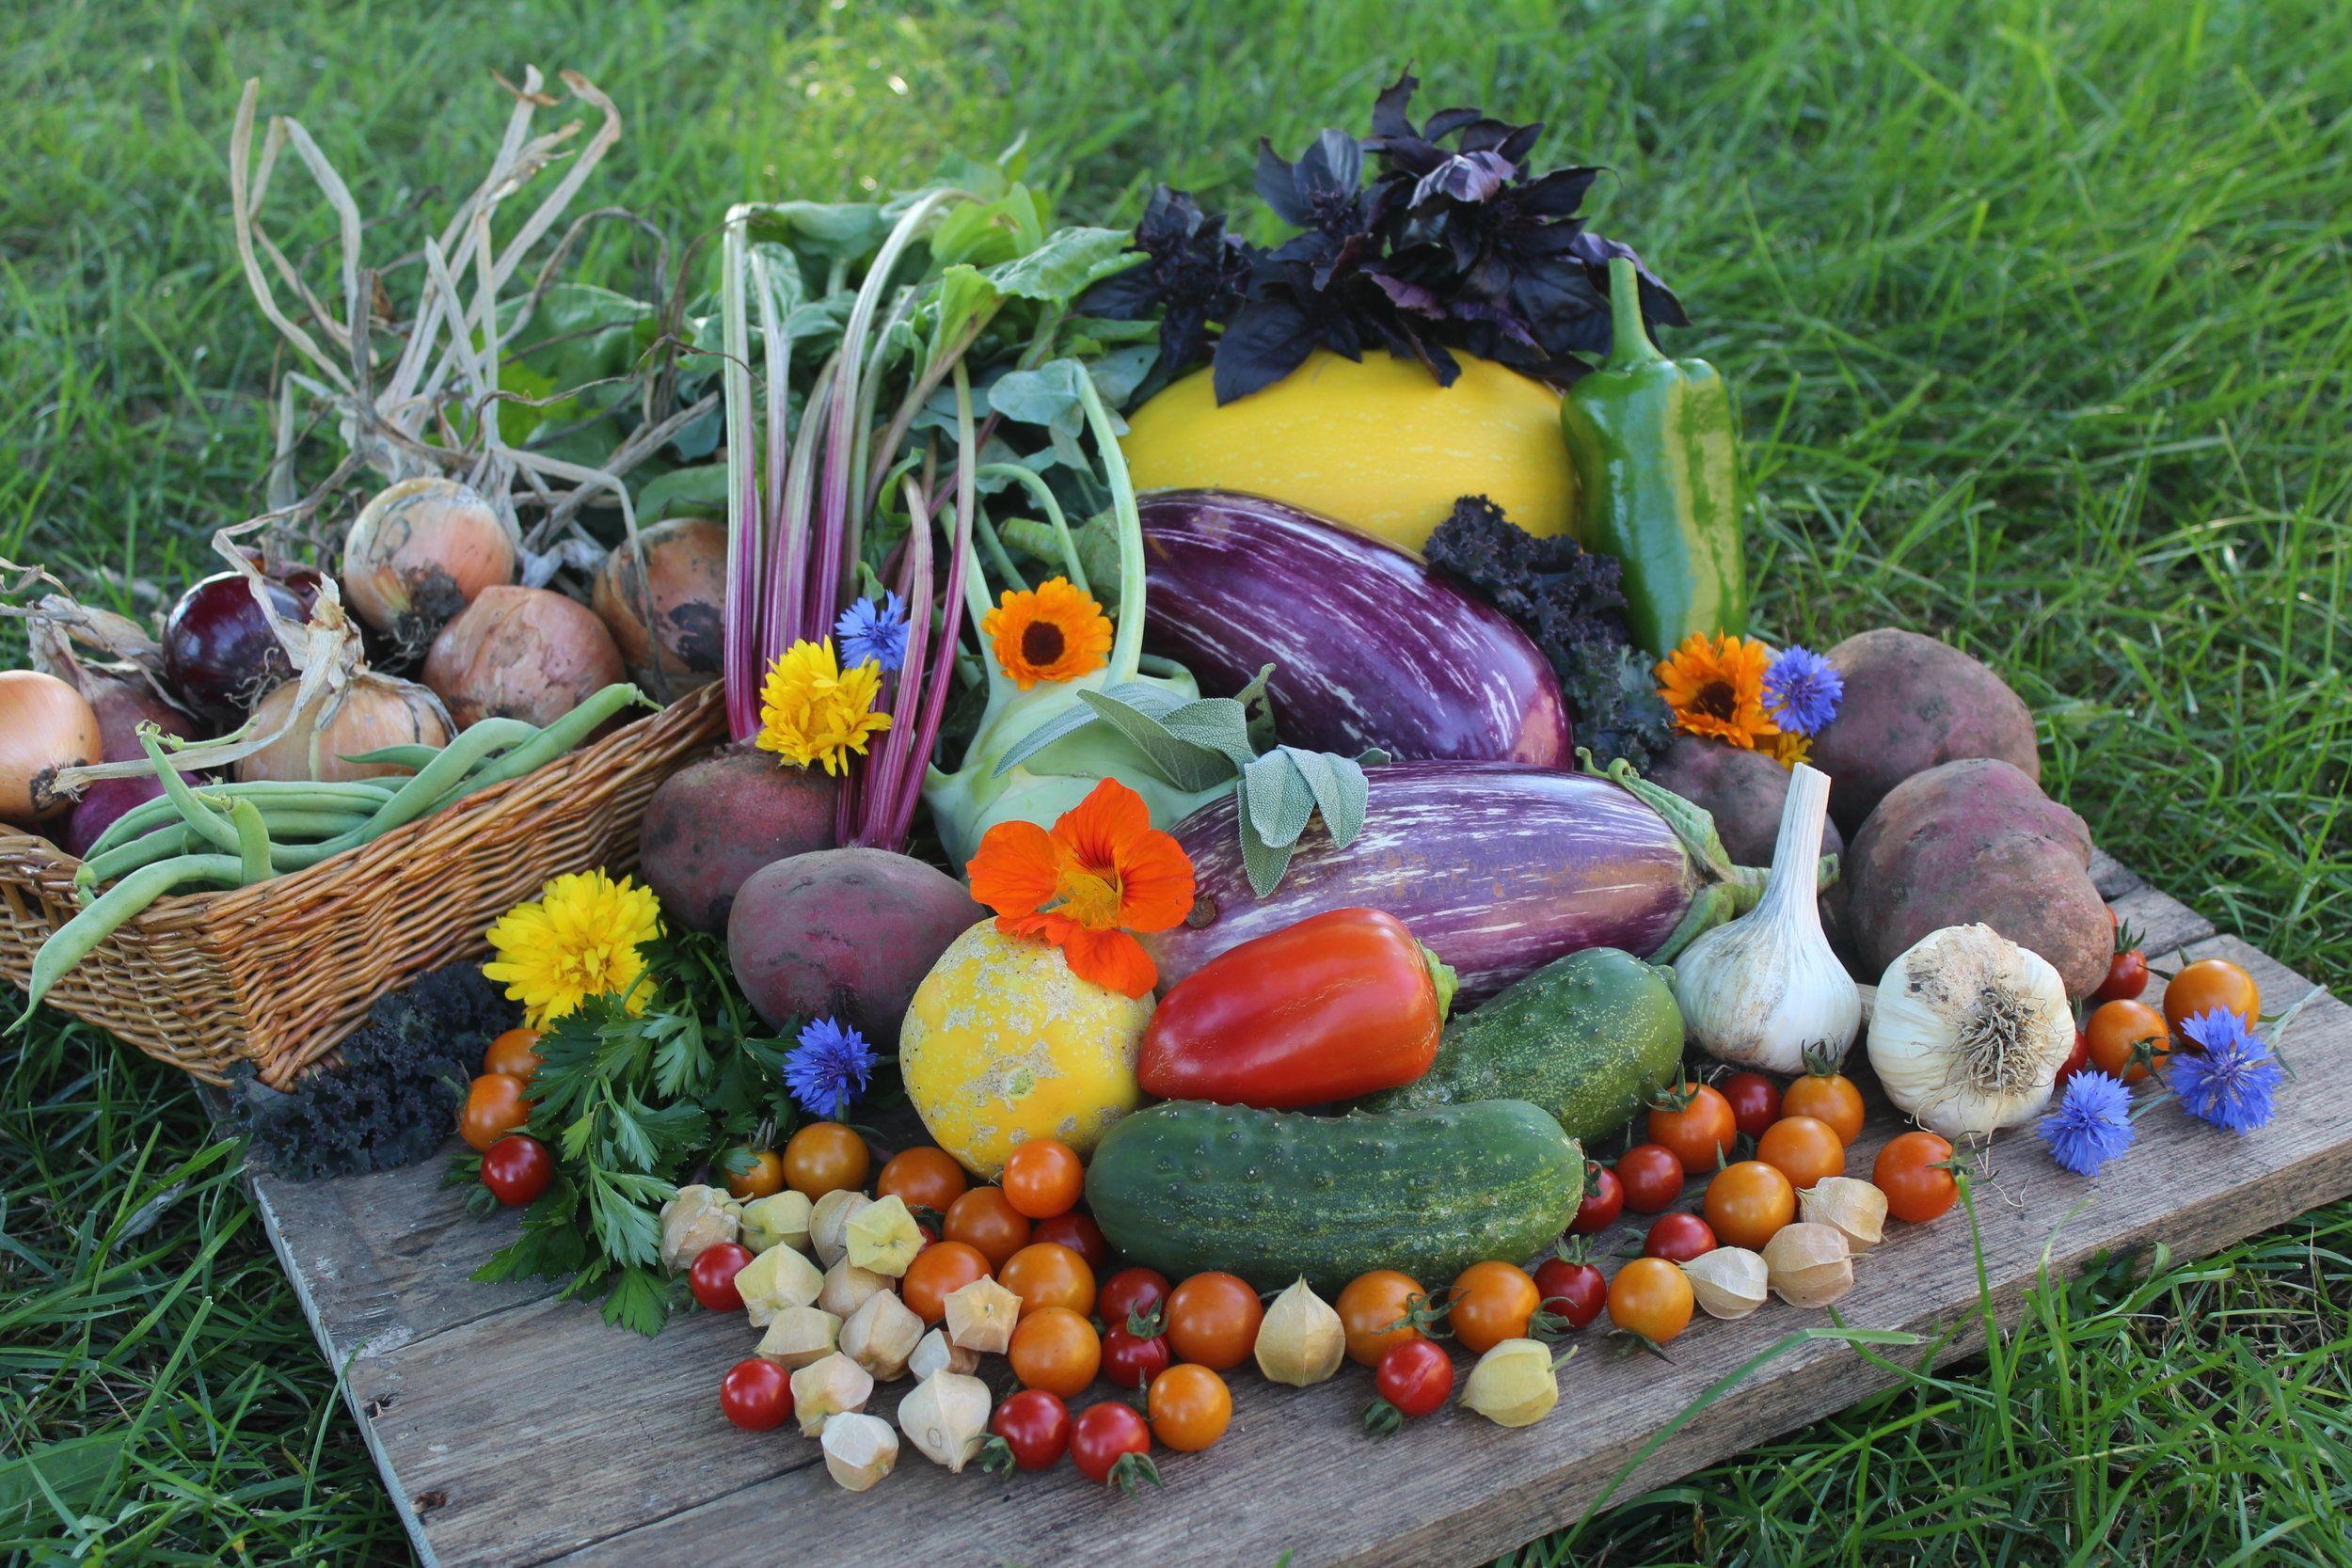 Glory garden south dakota online farmers market farm